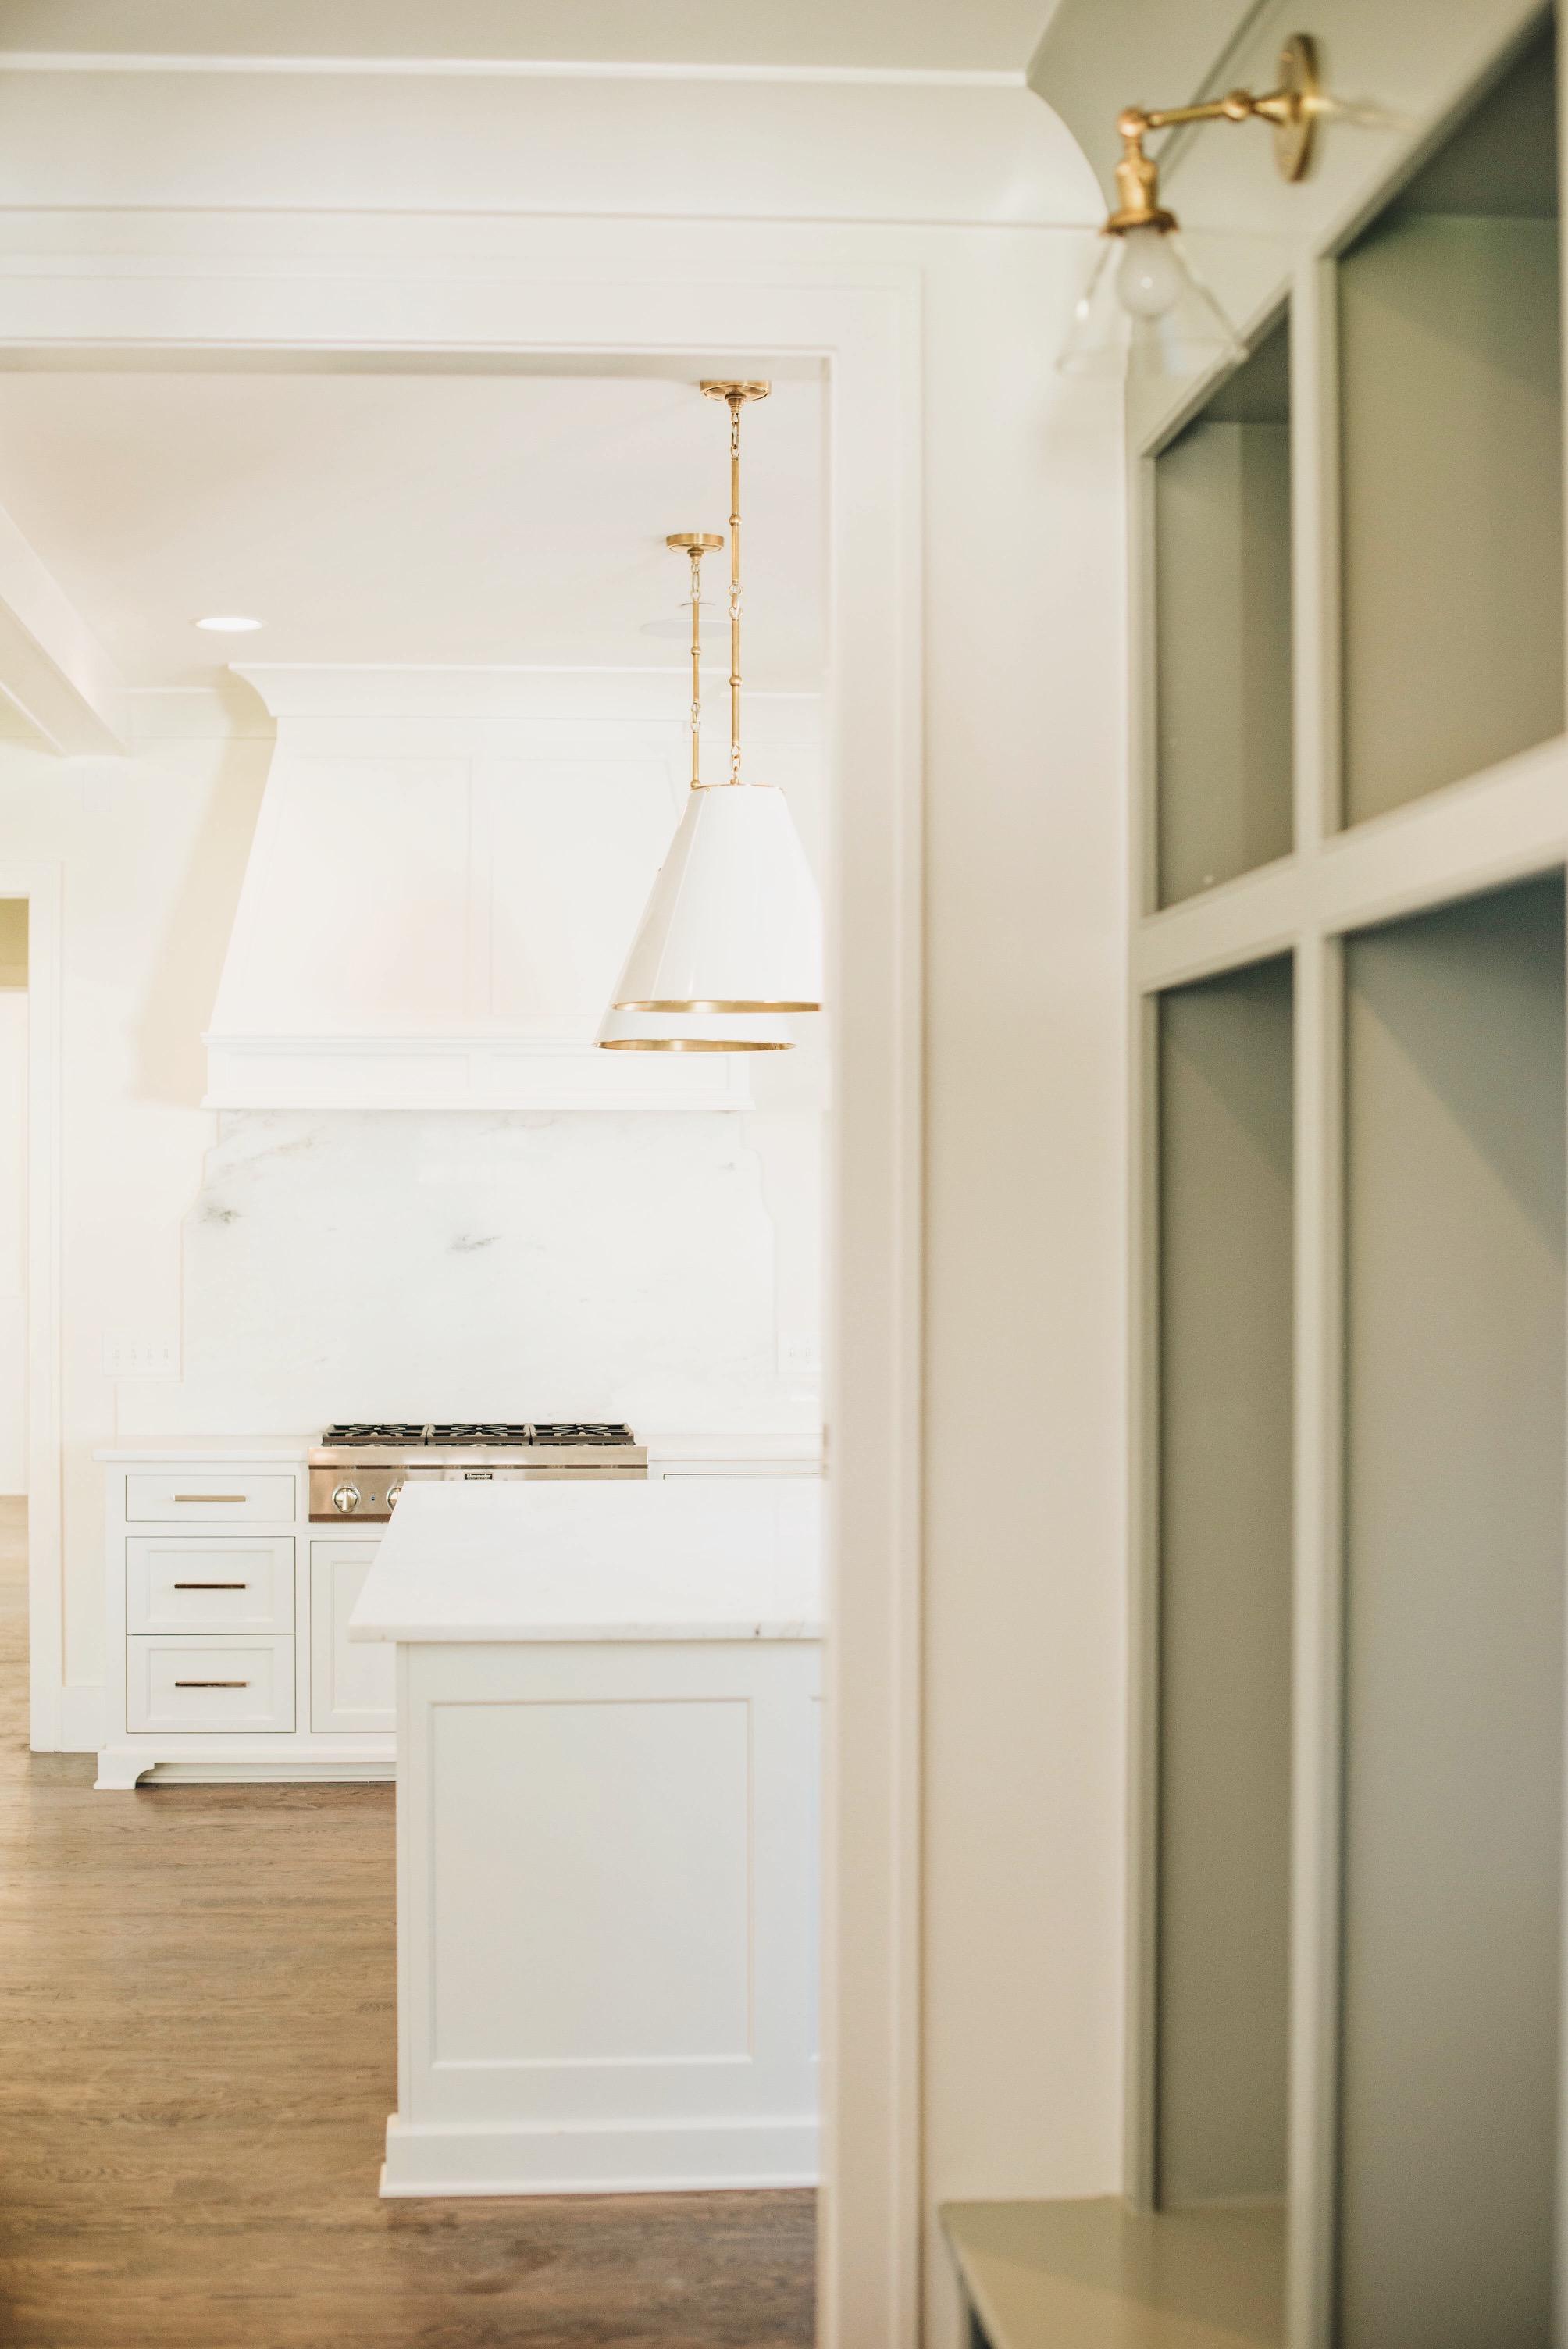 Mudroom Built Ins: BM River Gorge Gray   Kitchen Cabinetry: BM White Dove   Sarah Catherine Design